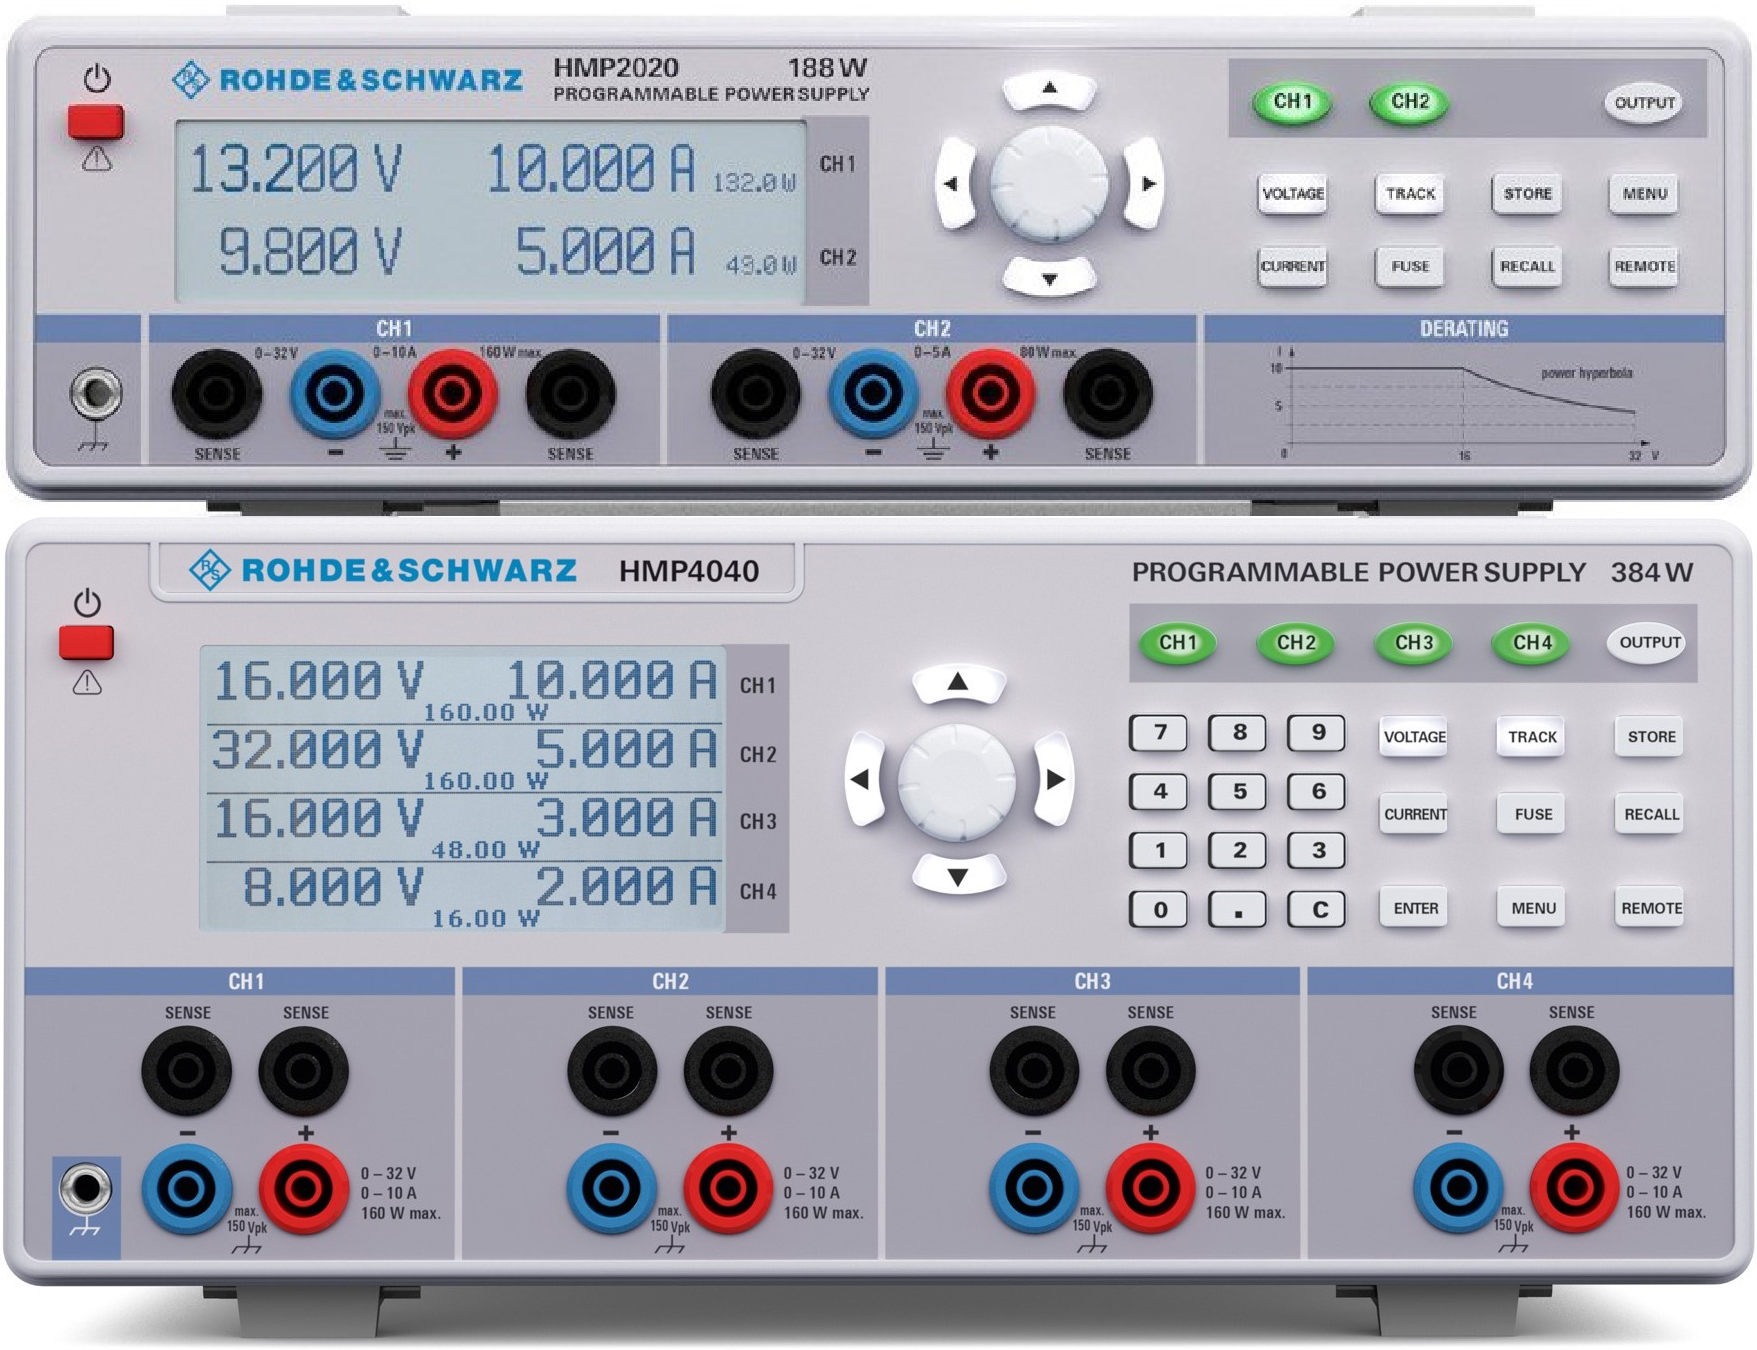 Rohde & Schwarz HMP series DC power supplies